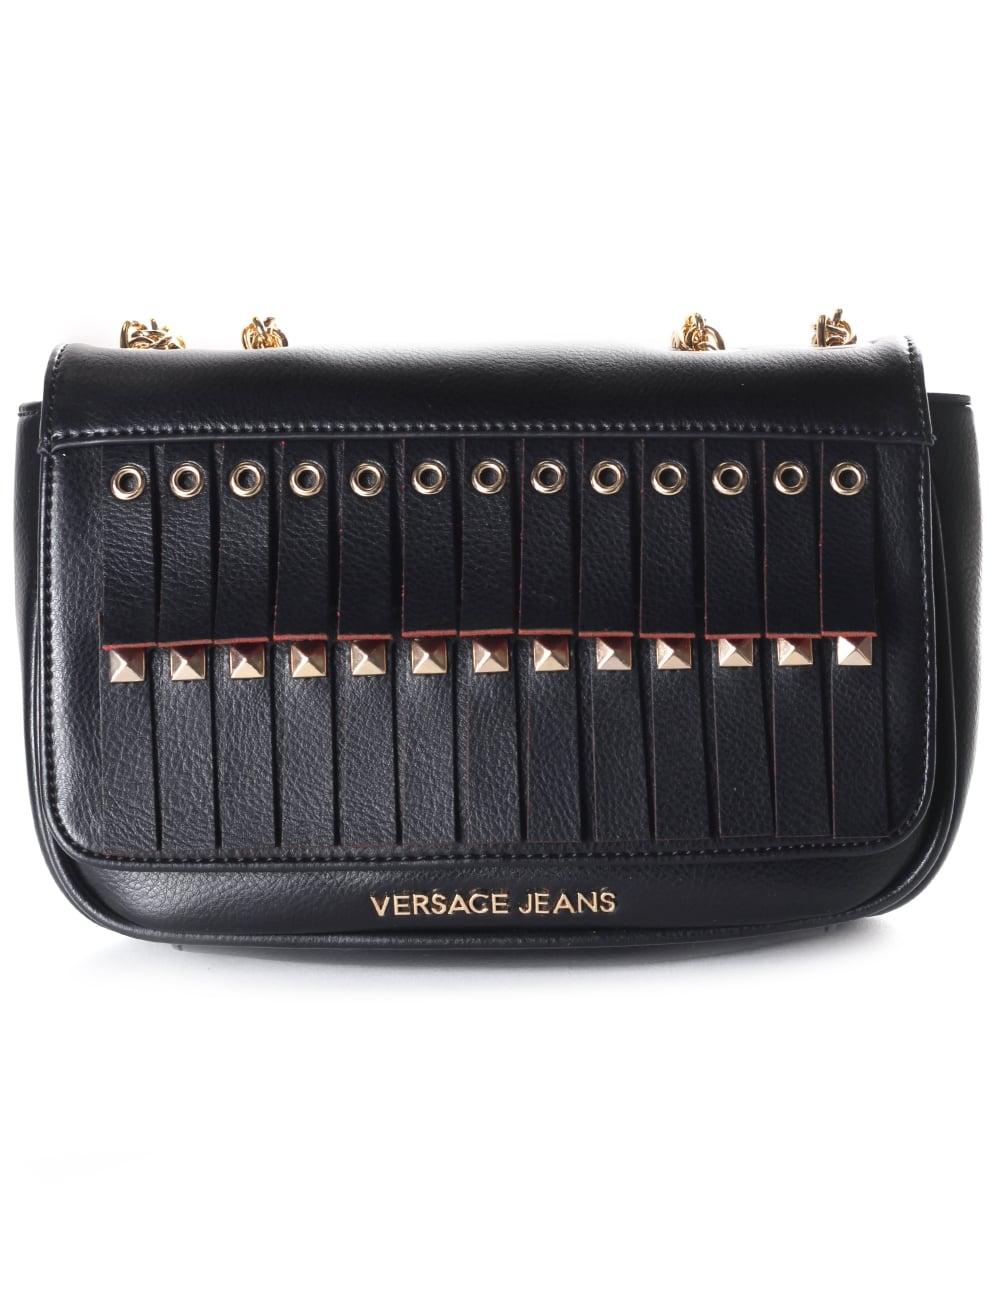 87b5c1f1a6 Versace Jeans Chain Strap Women s Tassel Crossbody Bag